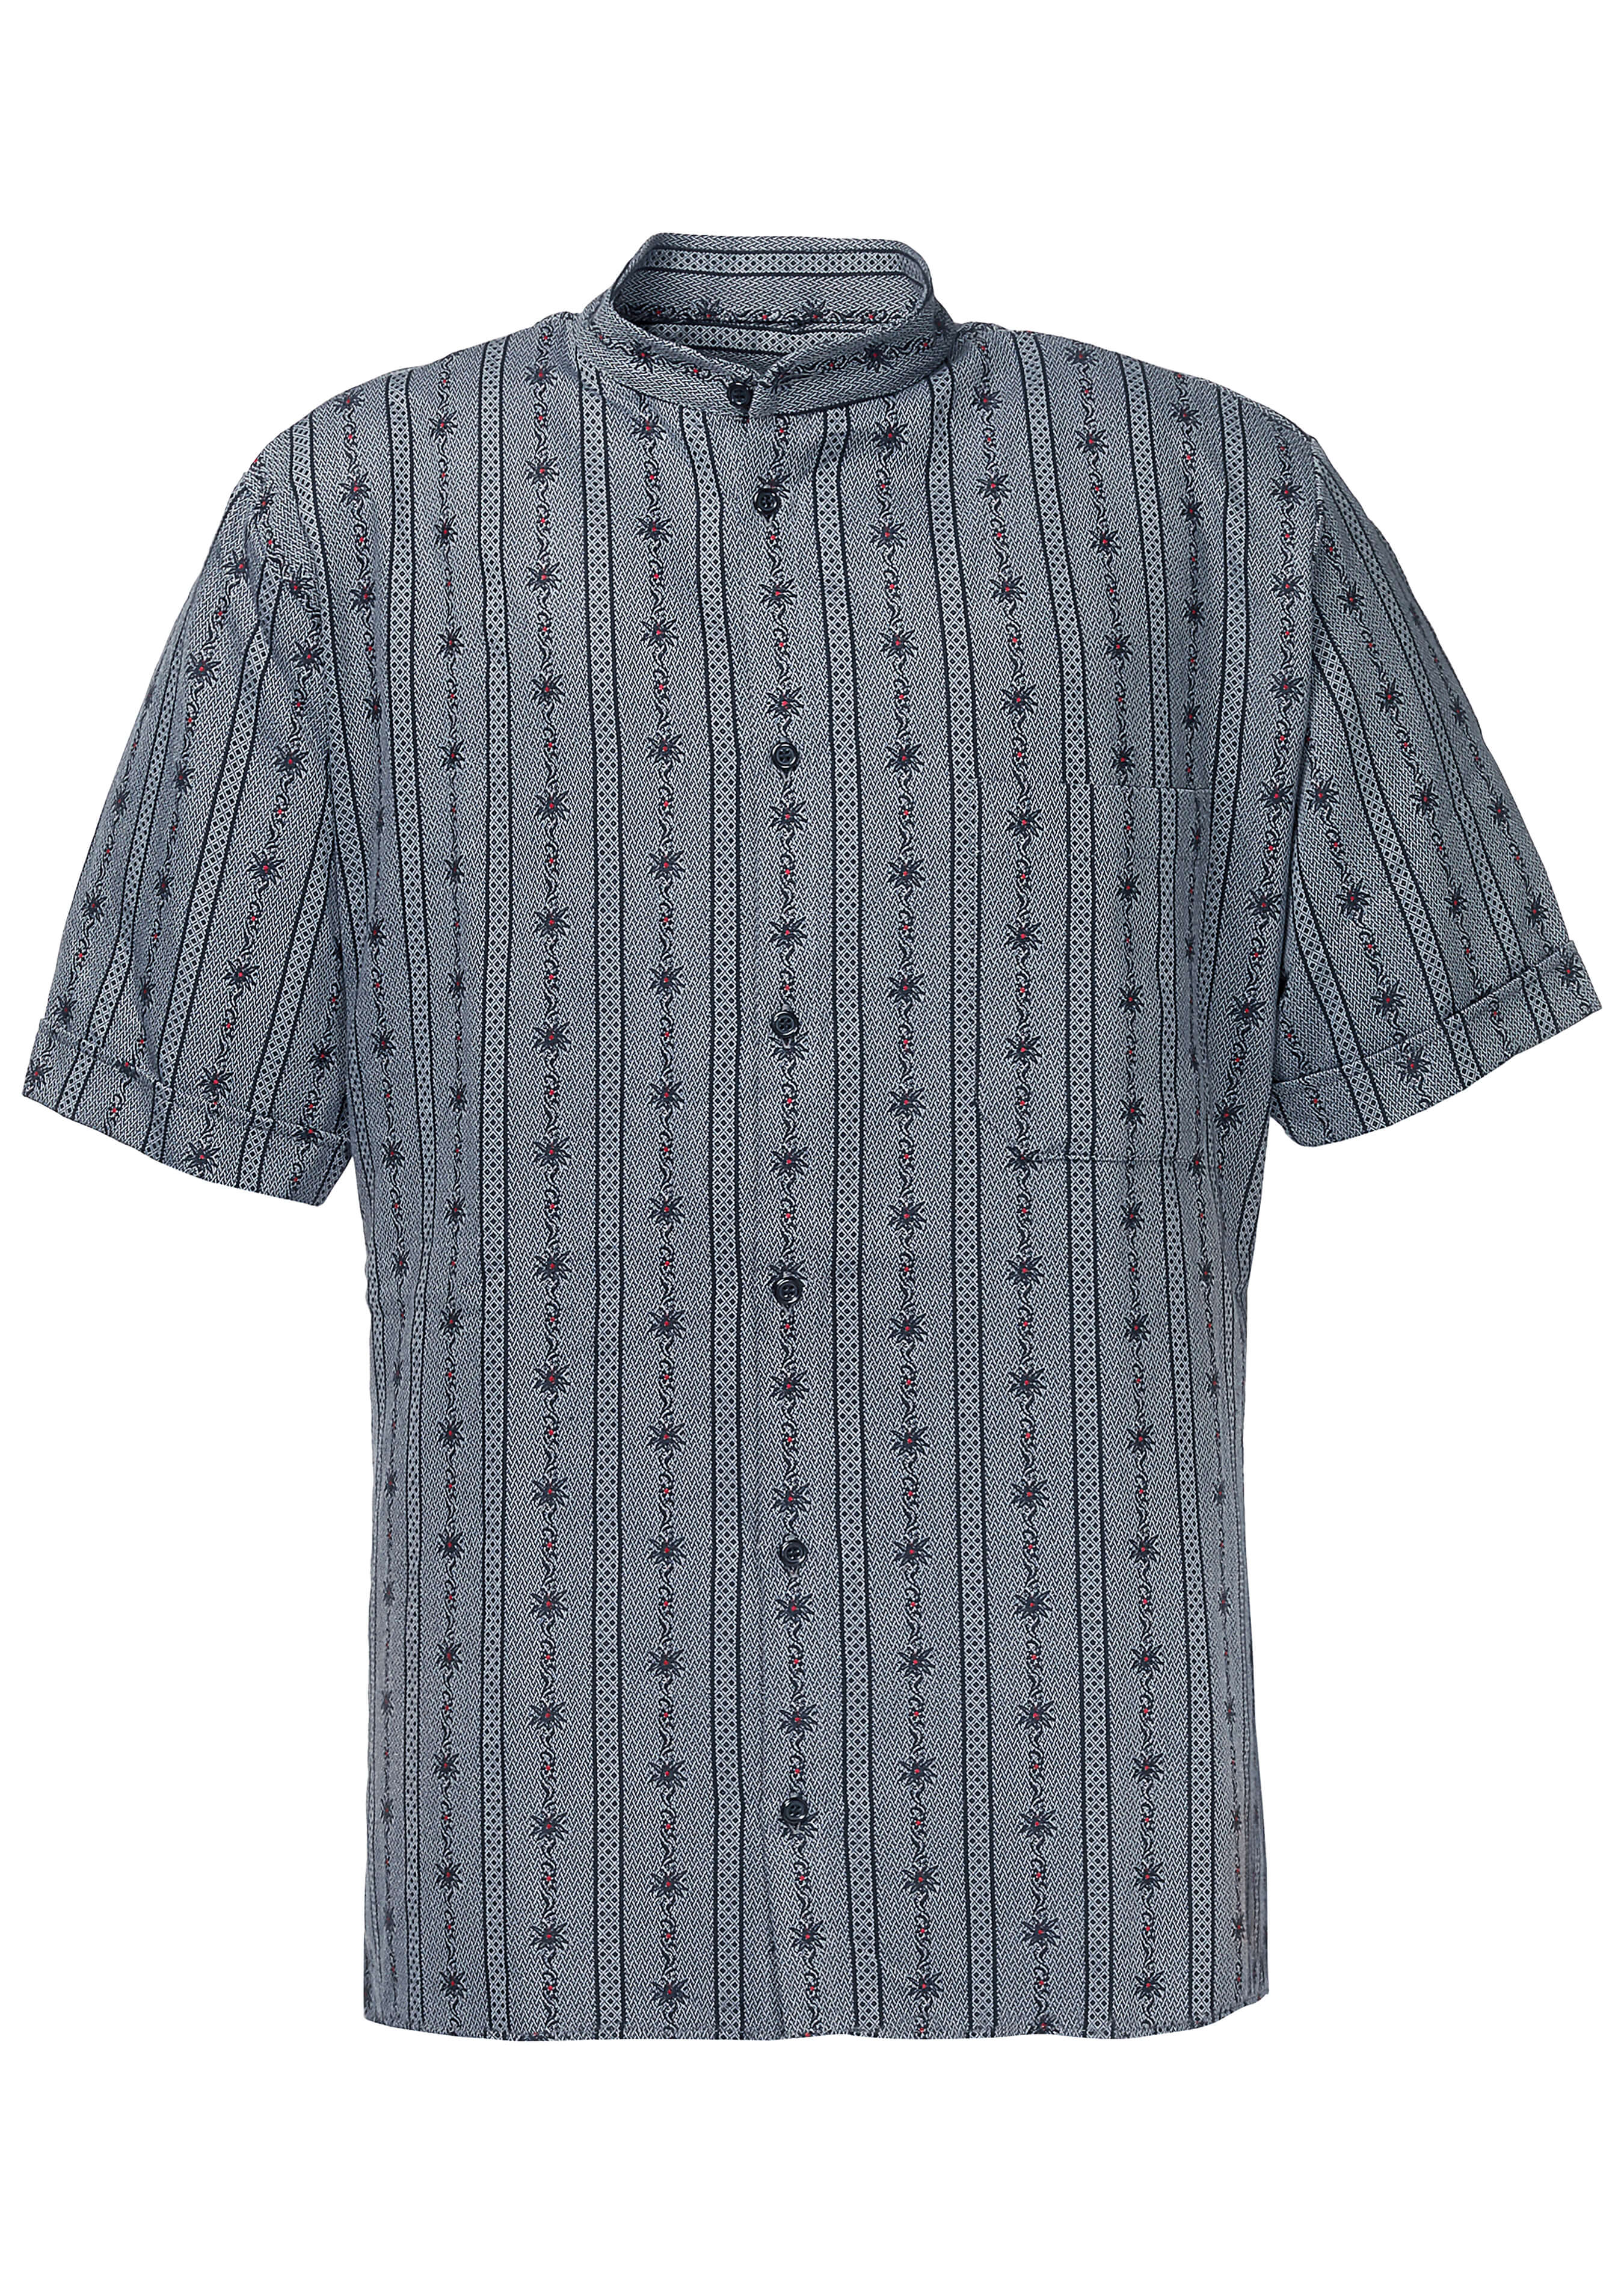 Edelweiss Hemd, ohne Kragen, kurzarm 27321236 1